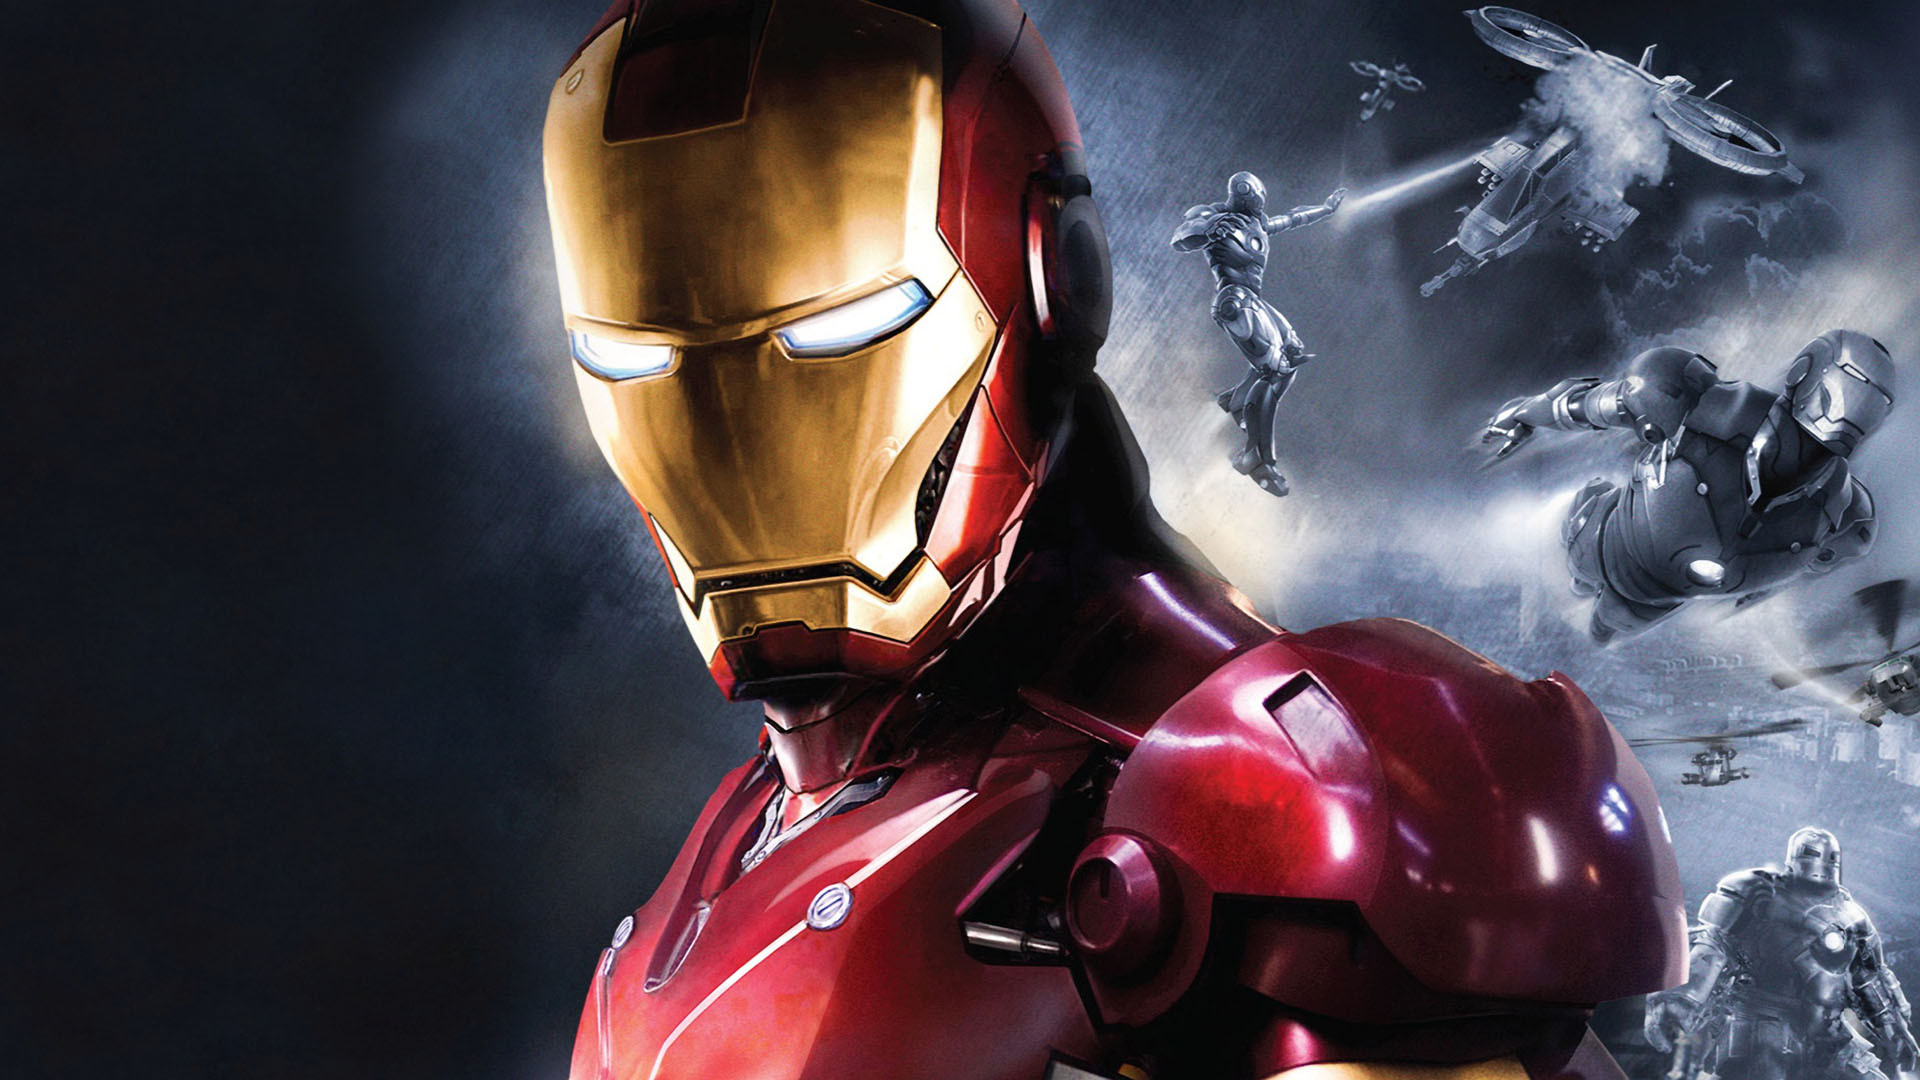 Avengers Prep Iron Man Podcast The Man Cave 1920x1080